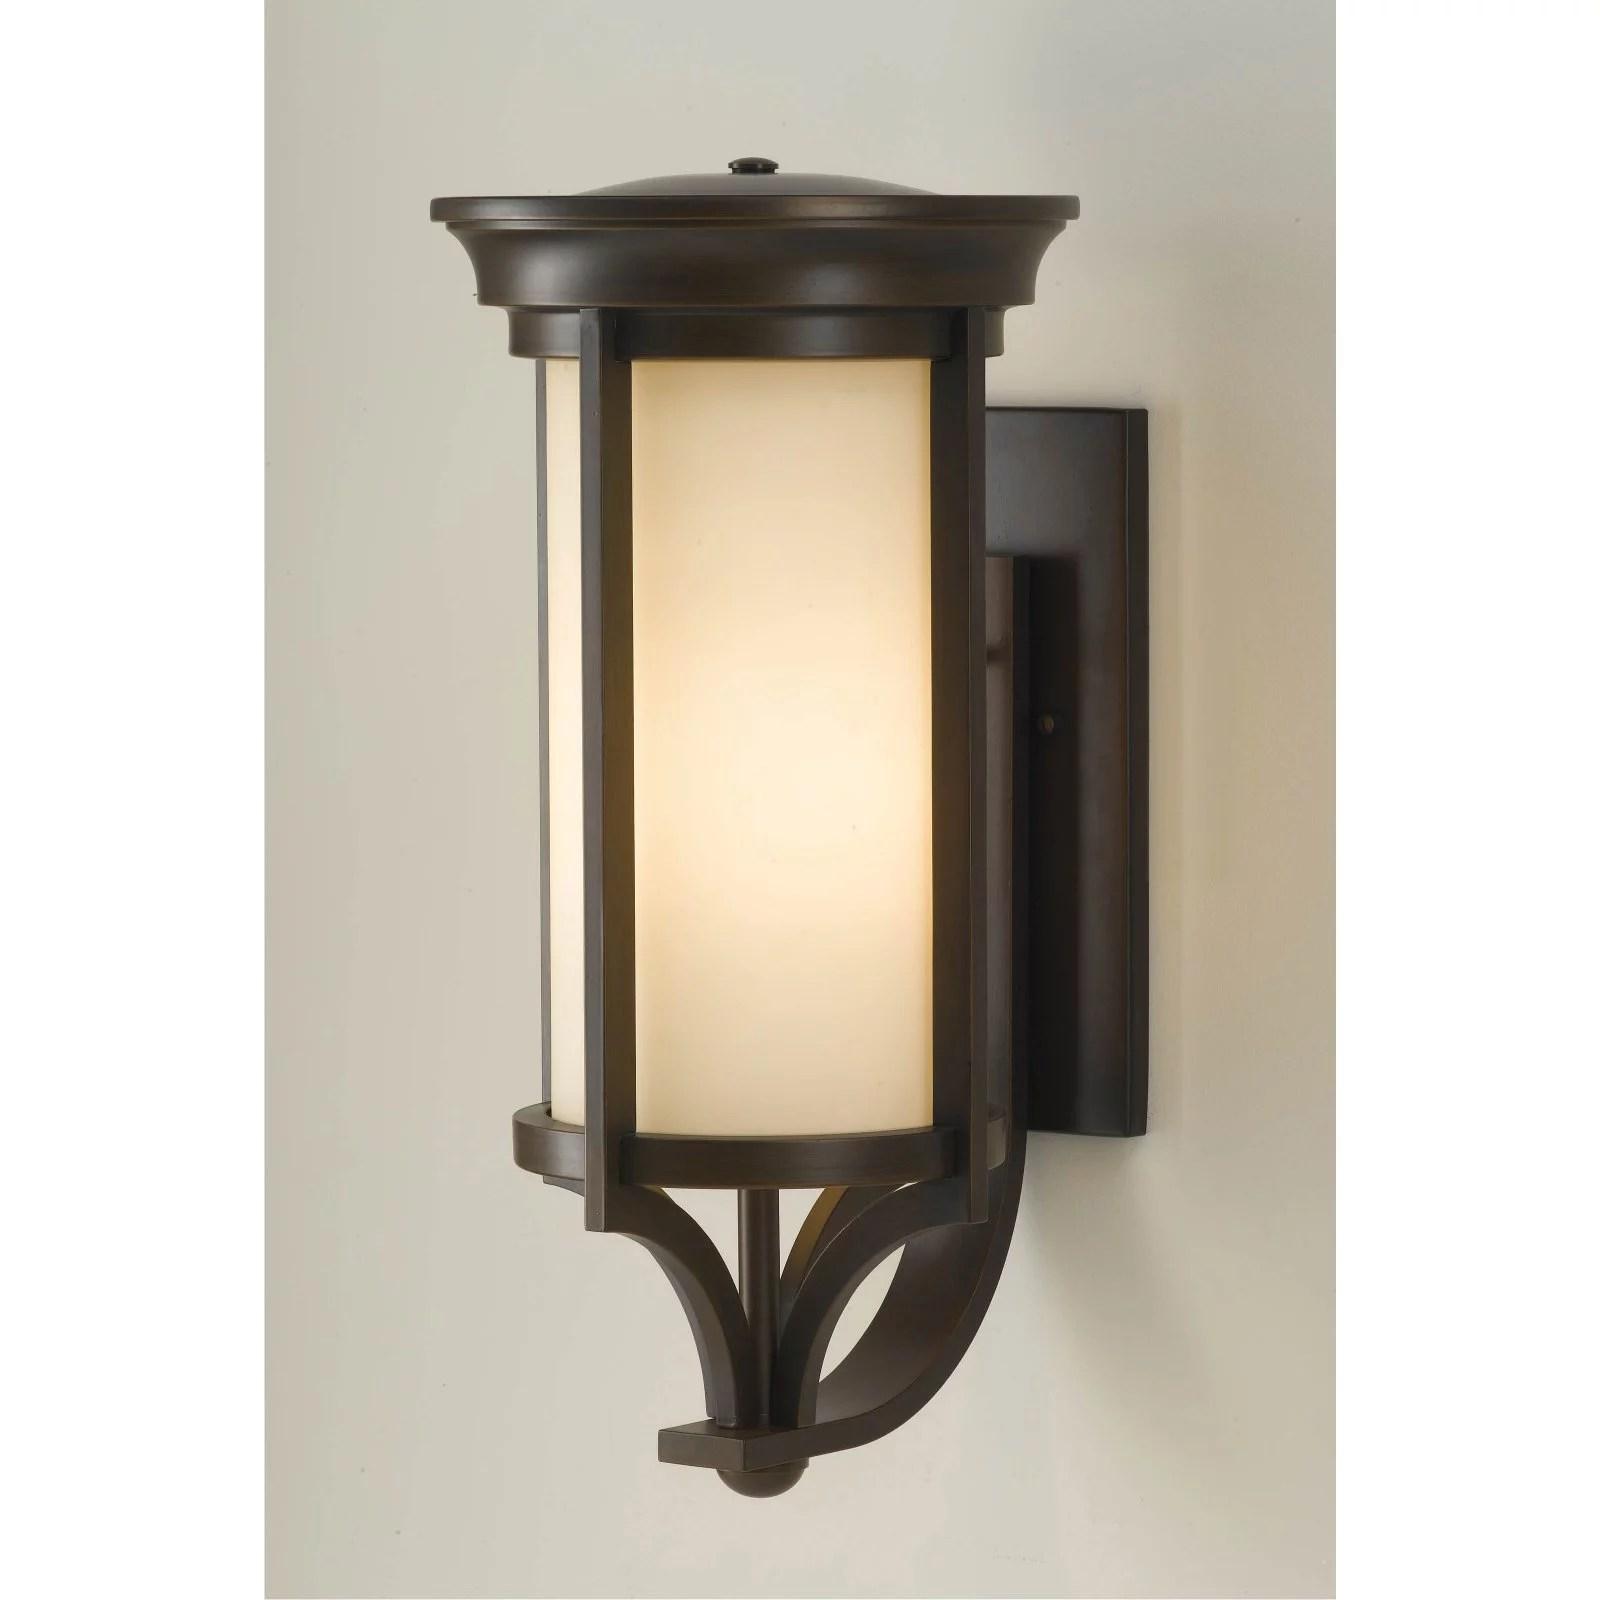 feiss merrill ol750 outdoor wall light heritage bronze